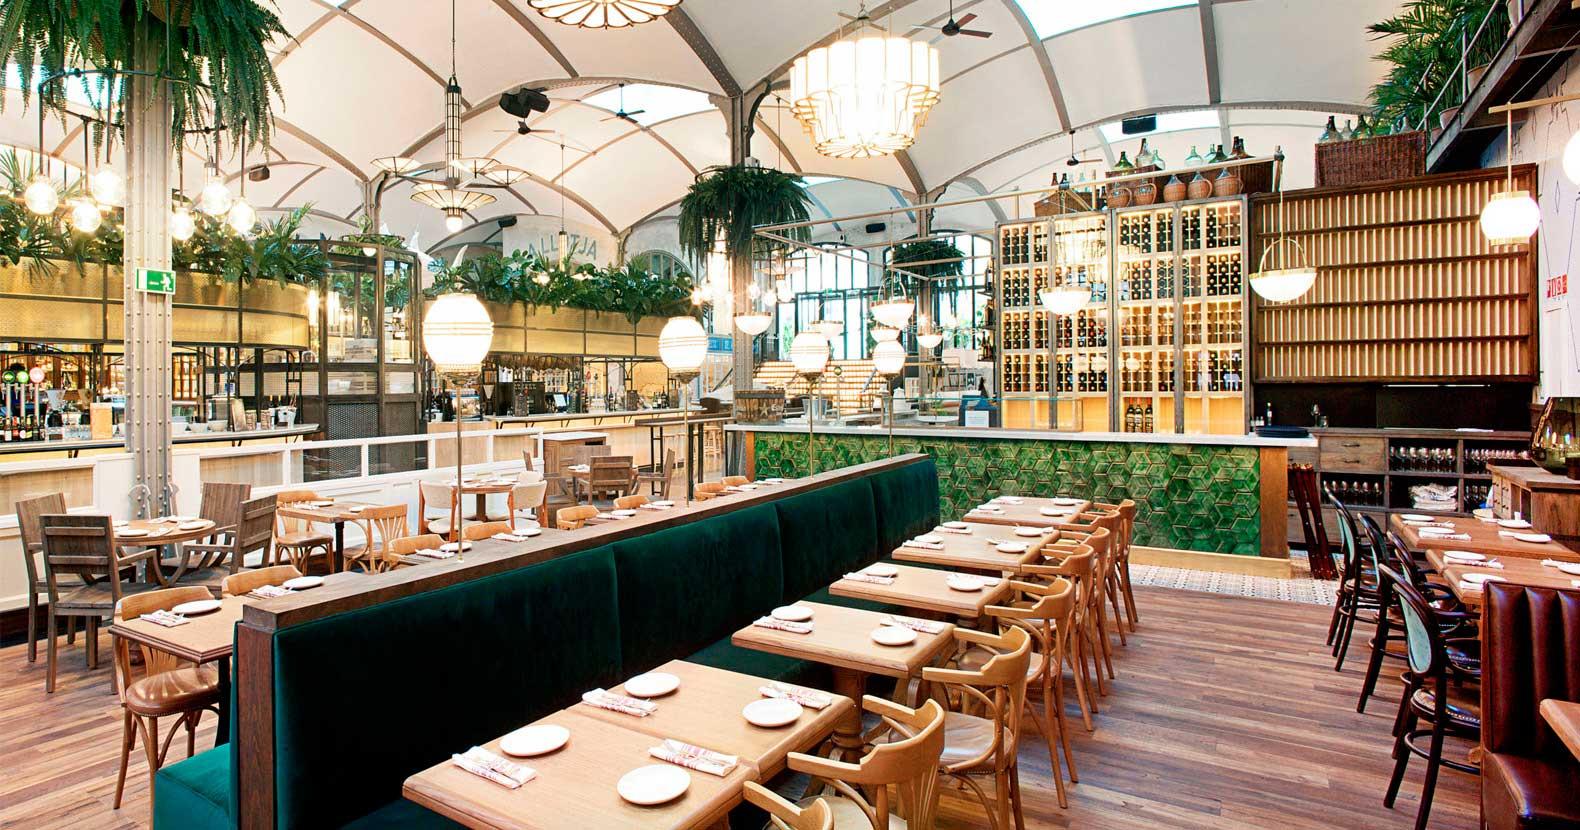 La taperia el nacional barcelona - Restaurantes passeig de gracia ...